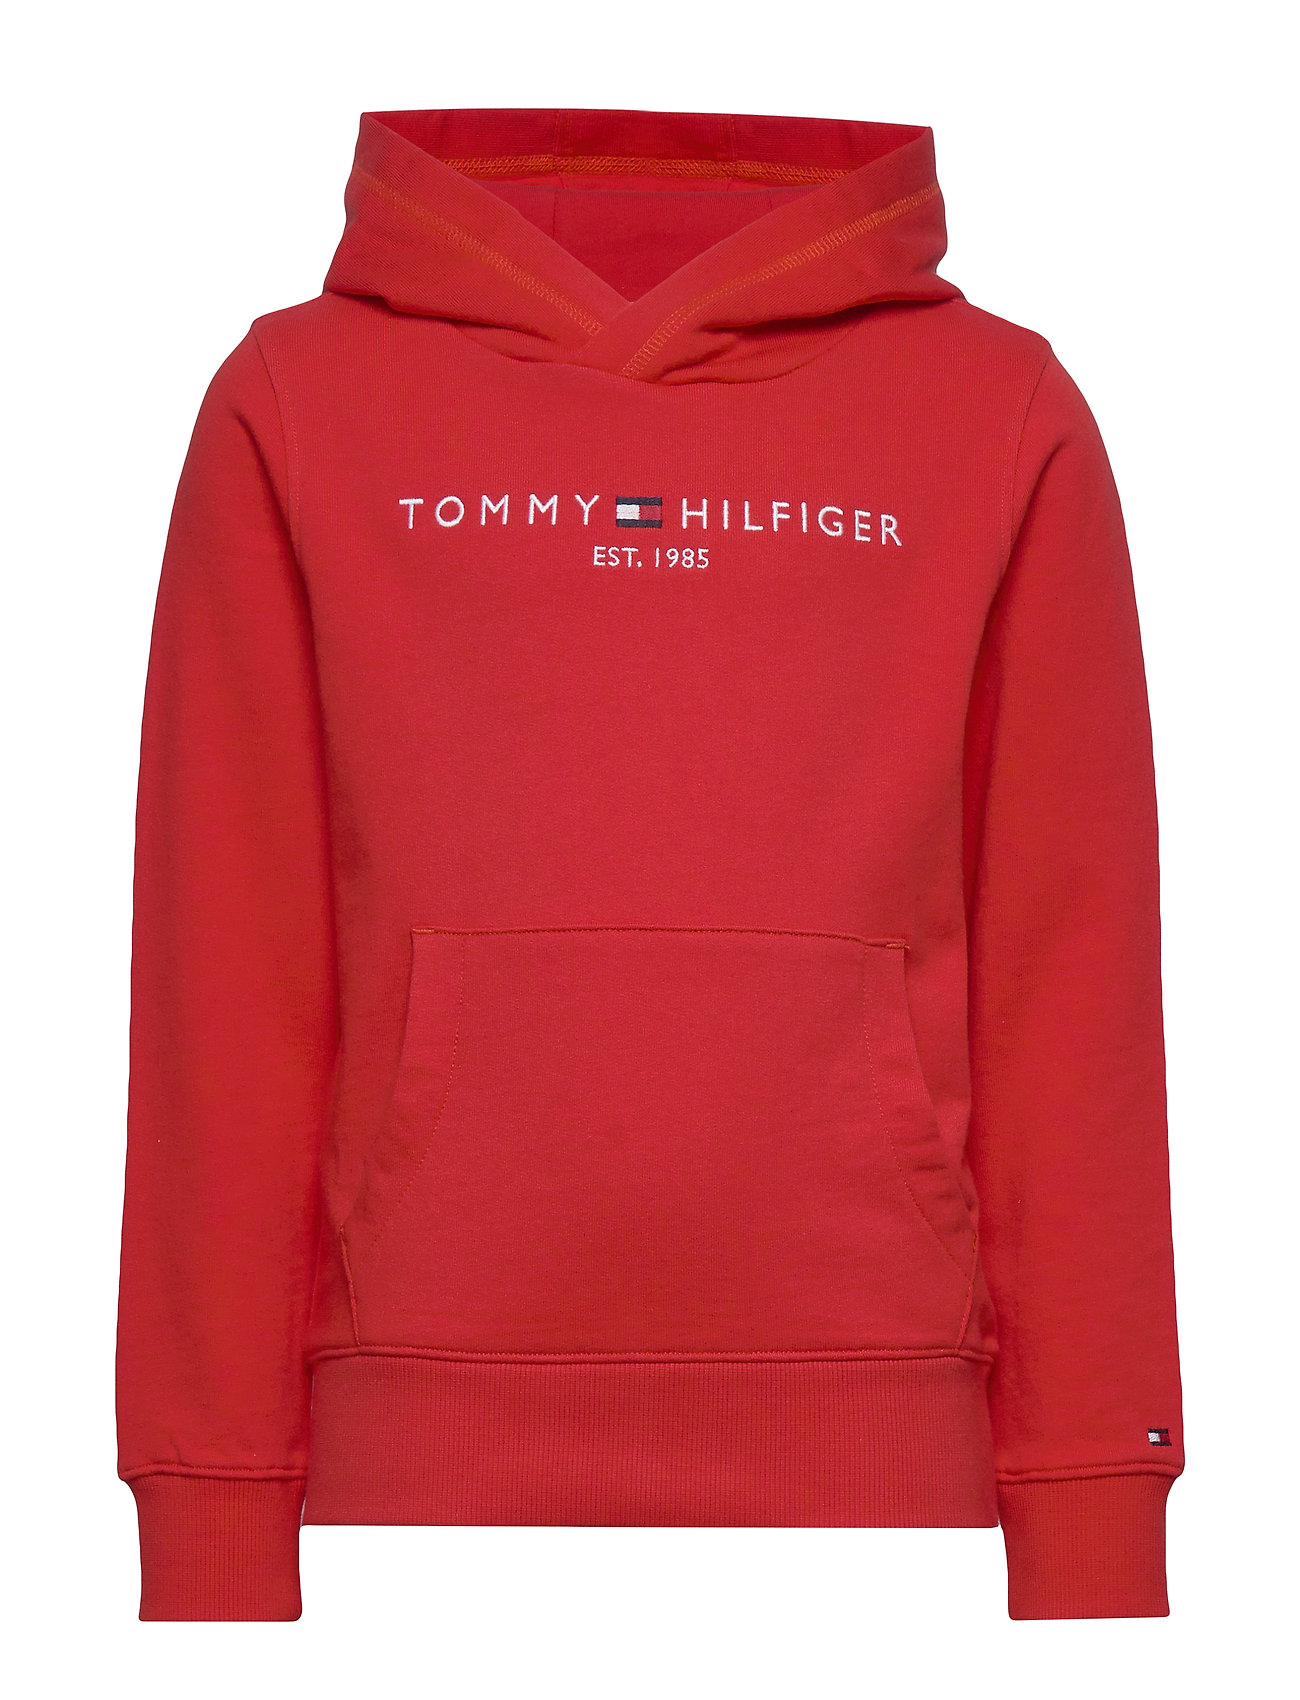 Tommy Hilfiger ESSENTIAL HOODIE - DEEP CRIMSON 106-880